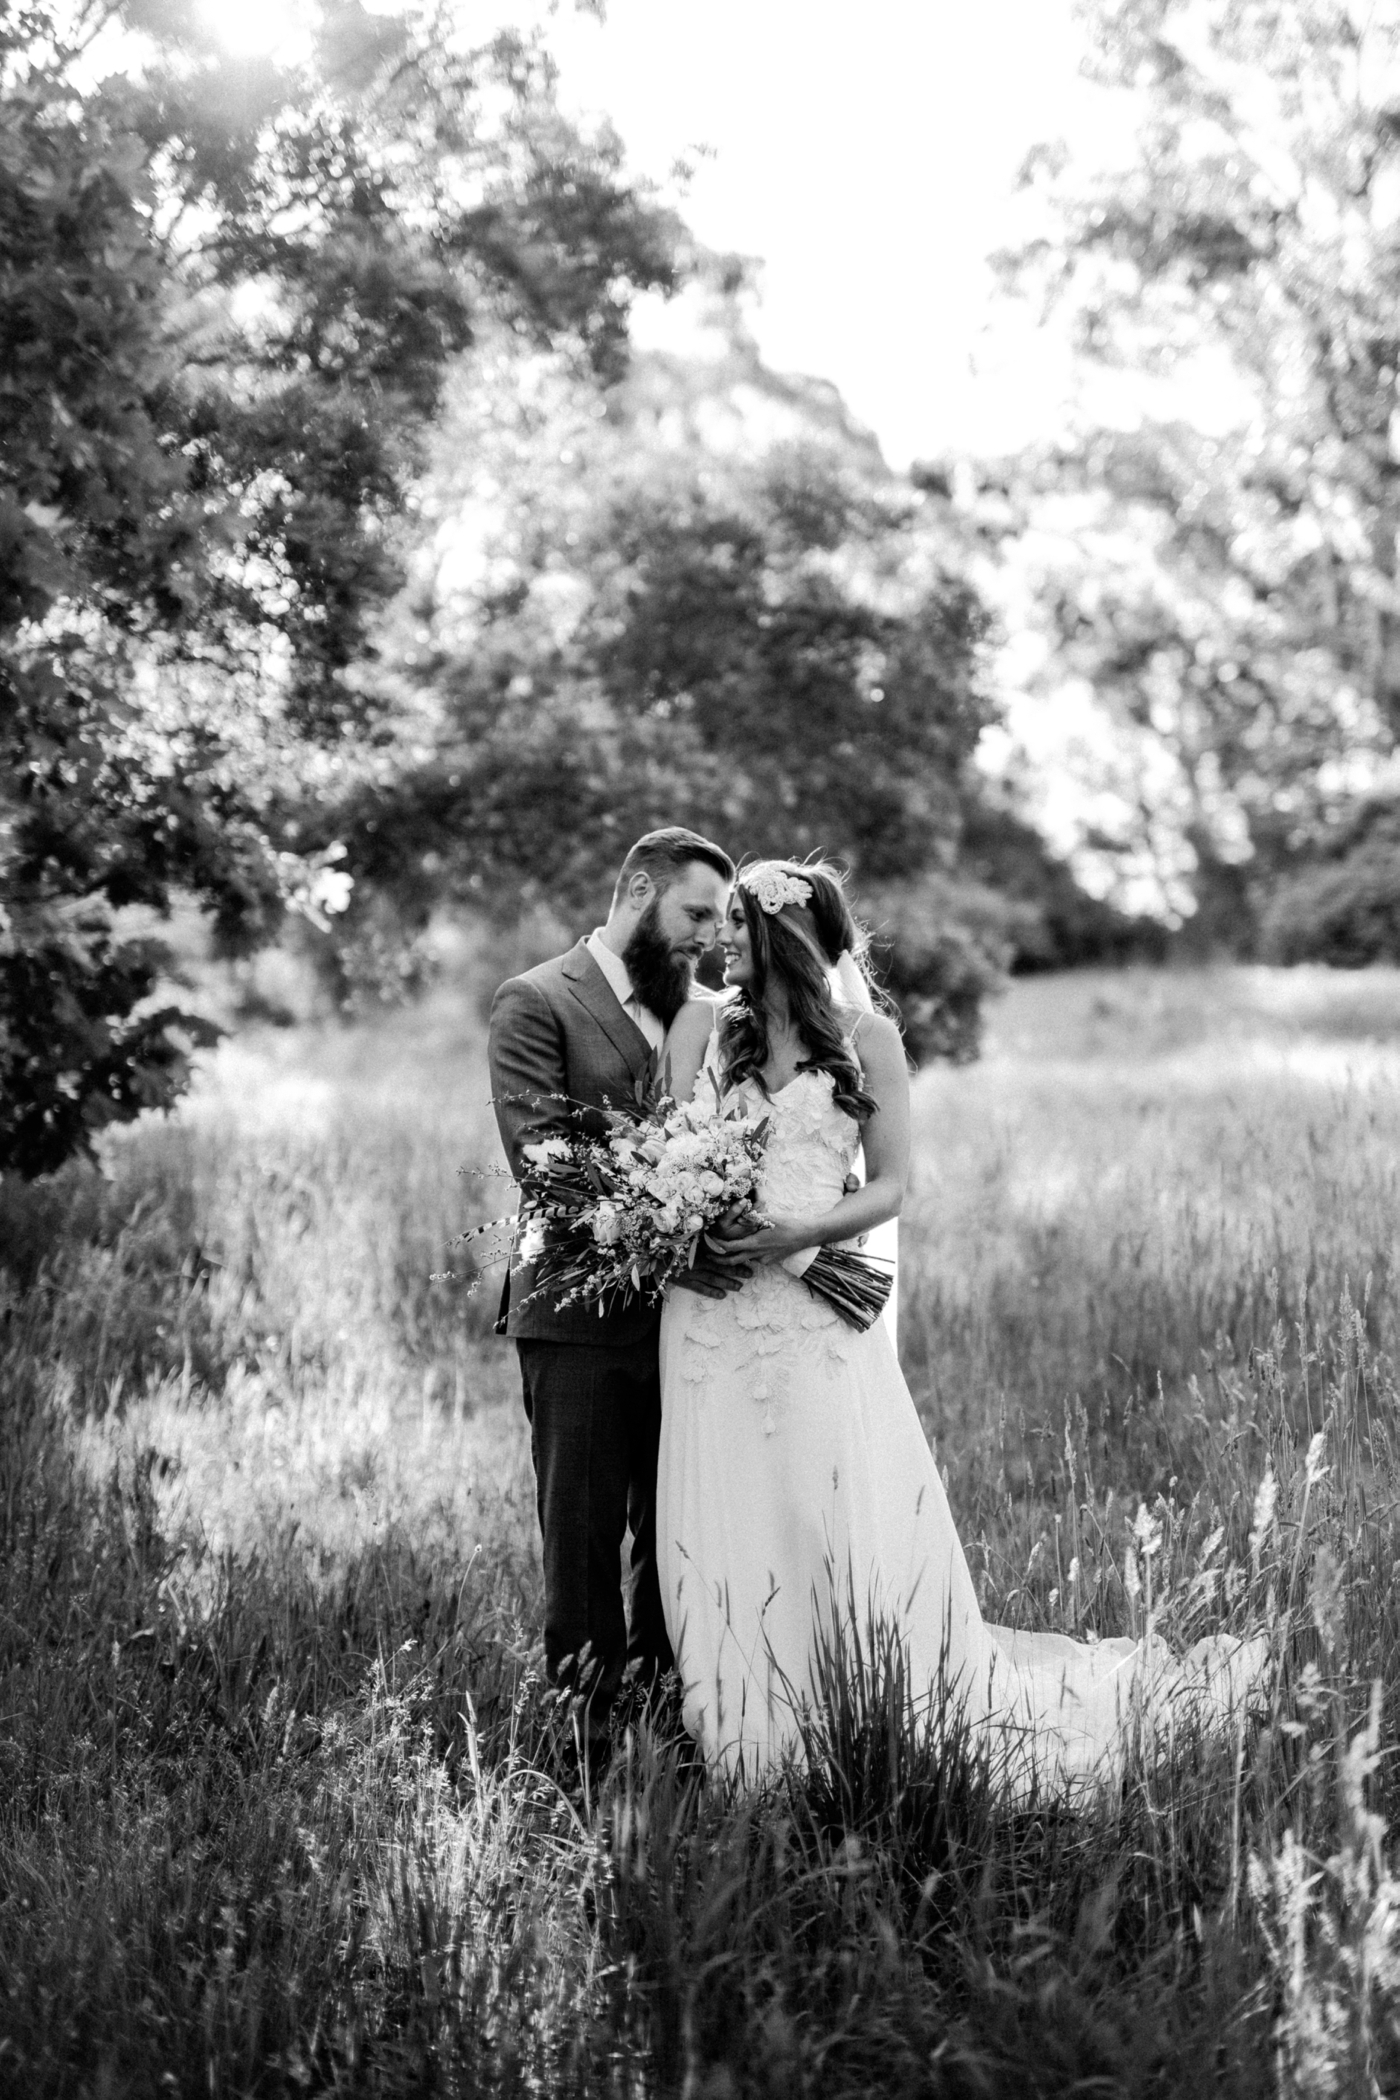 Maddy & Wes - K1 by Geoff Hardy Wedding - Adelaide Wedding Photographer - Natural wedding photography in Adelaide - Katherine Schultz_0046.jpg